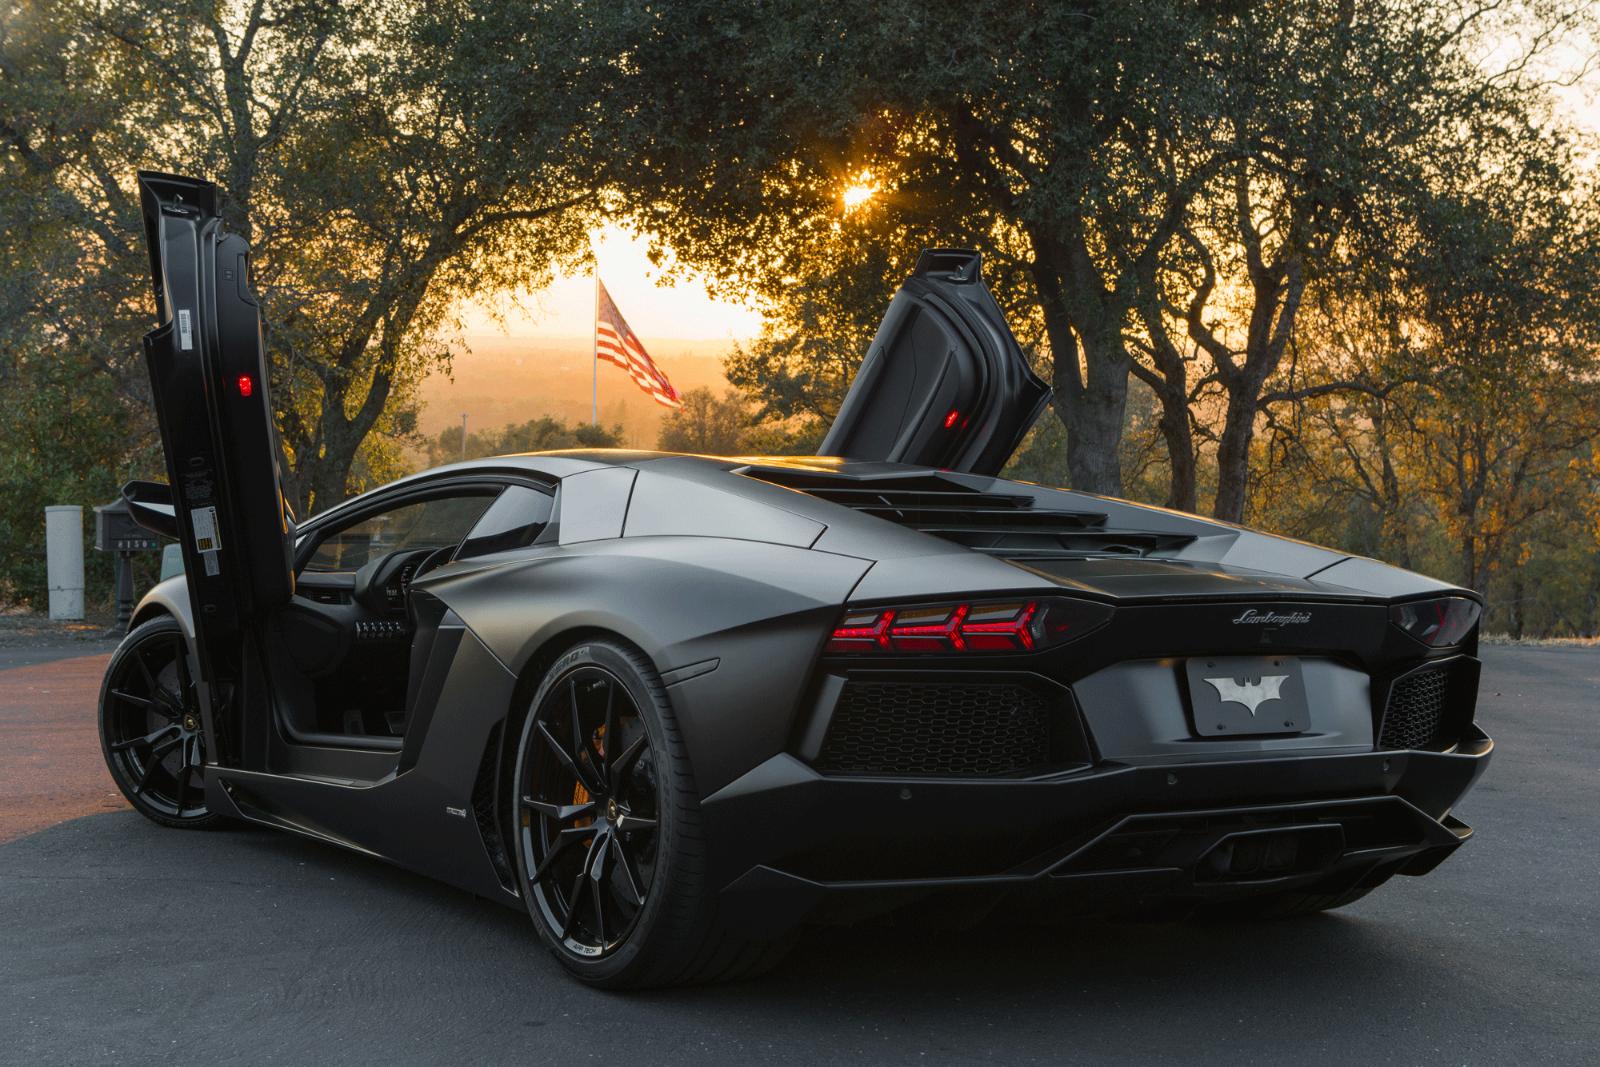 Great 2013 Lamborghini Aventador Lp700 Coupe 2 Door